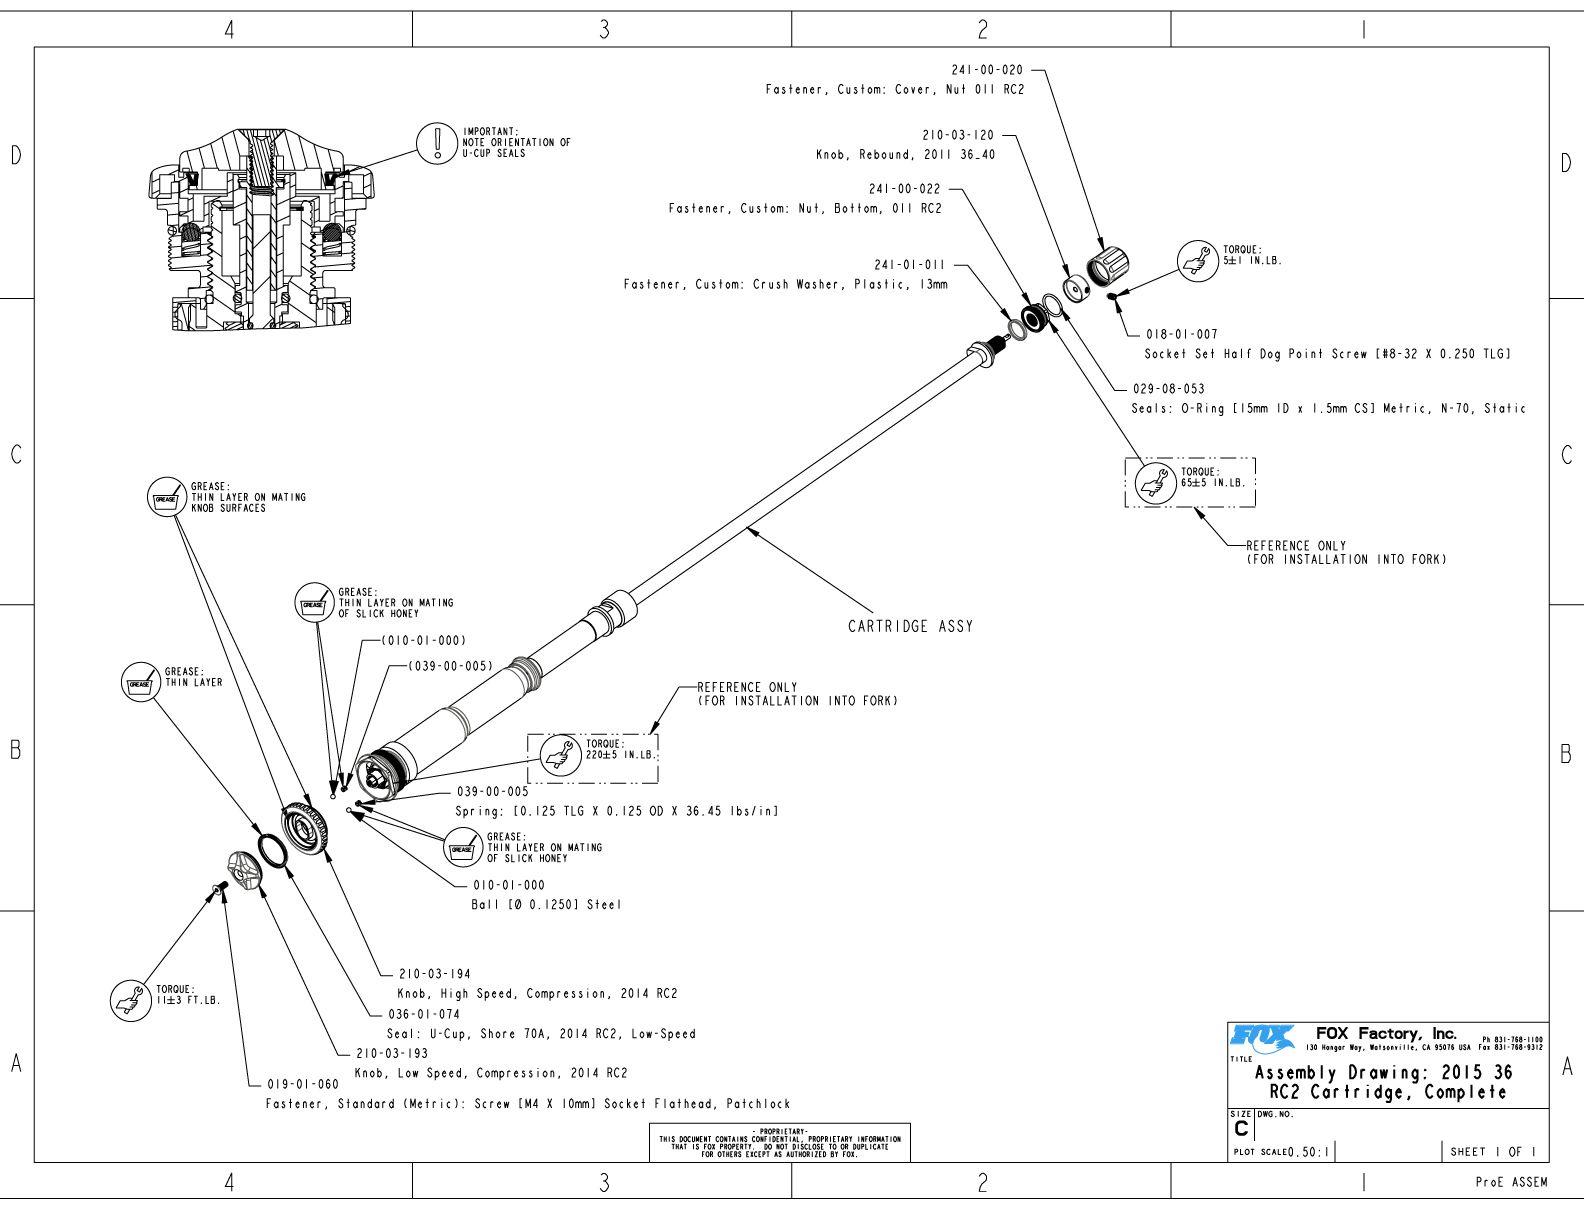 36mm Part Information